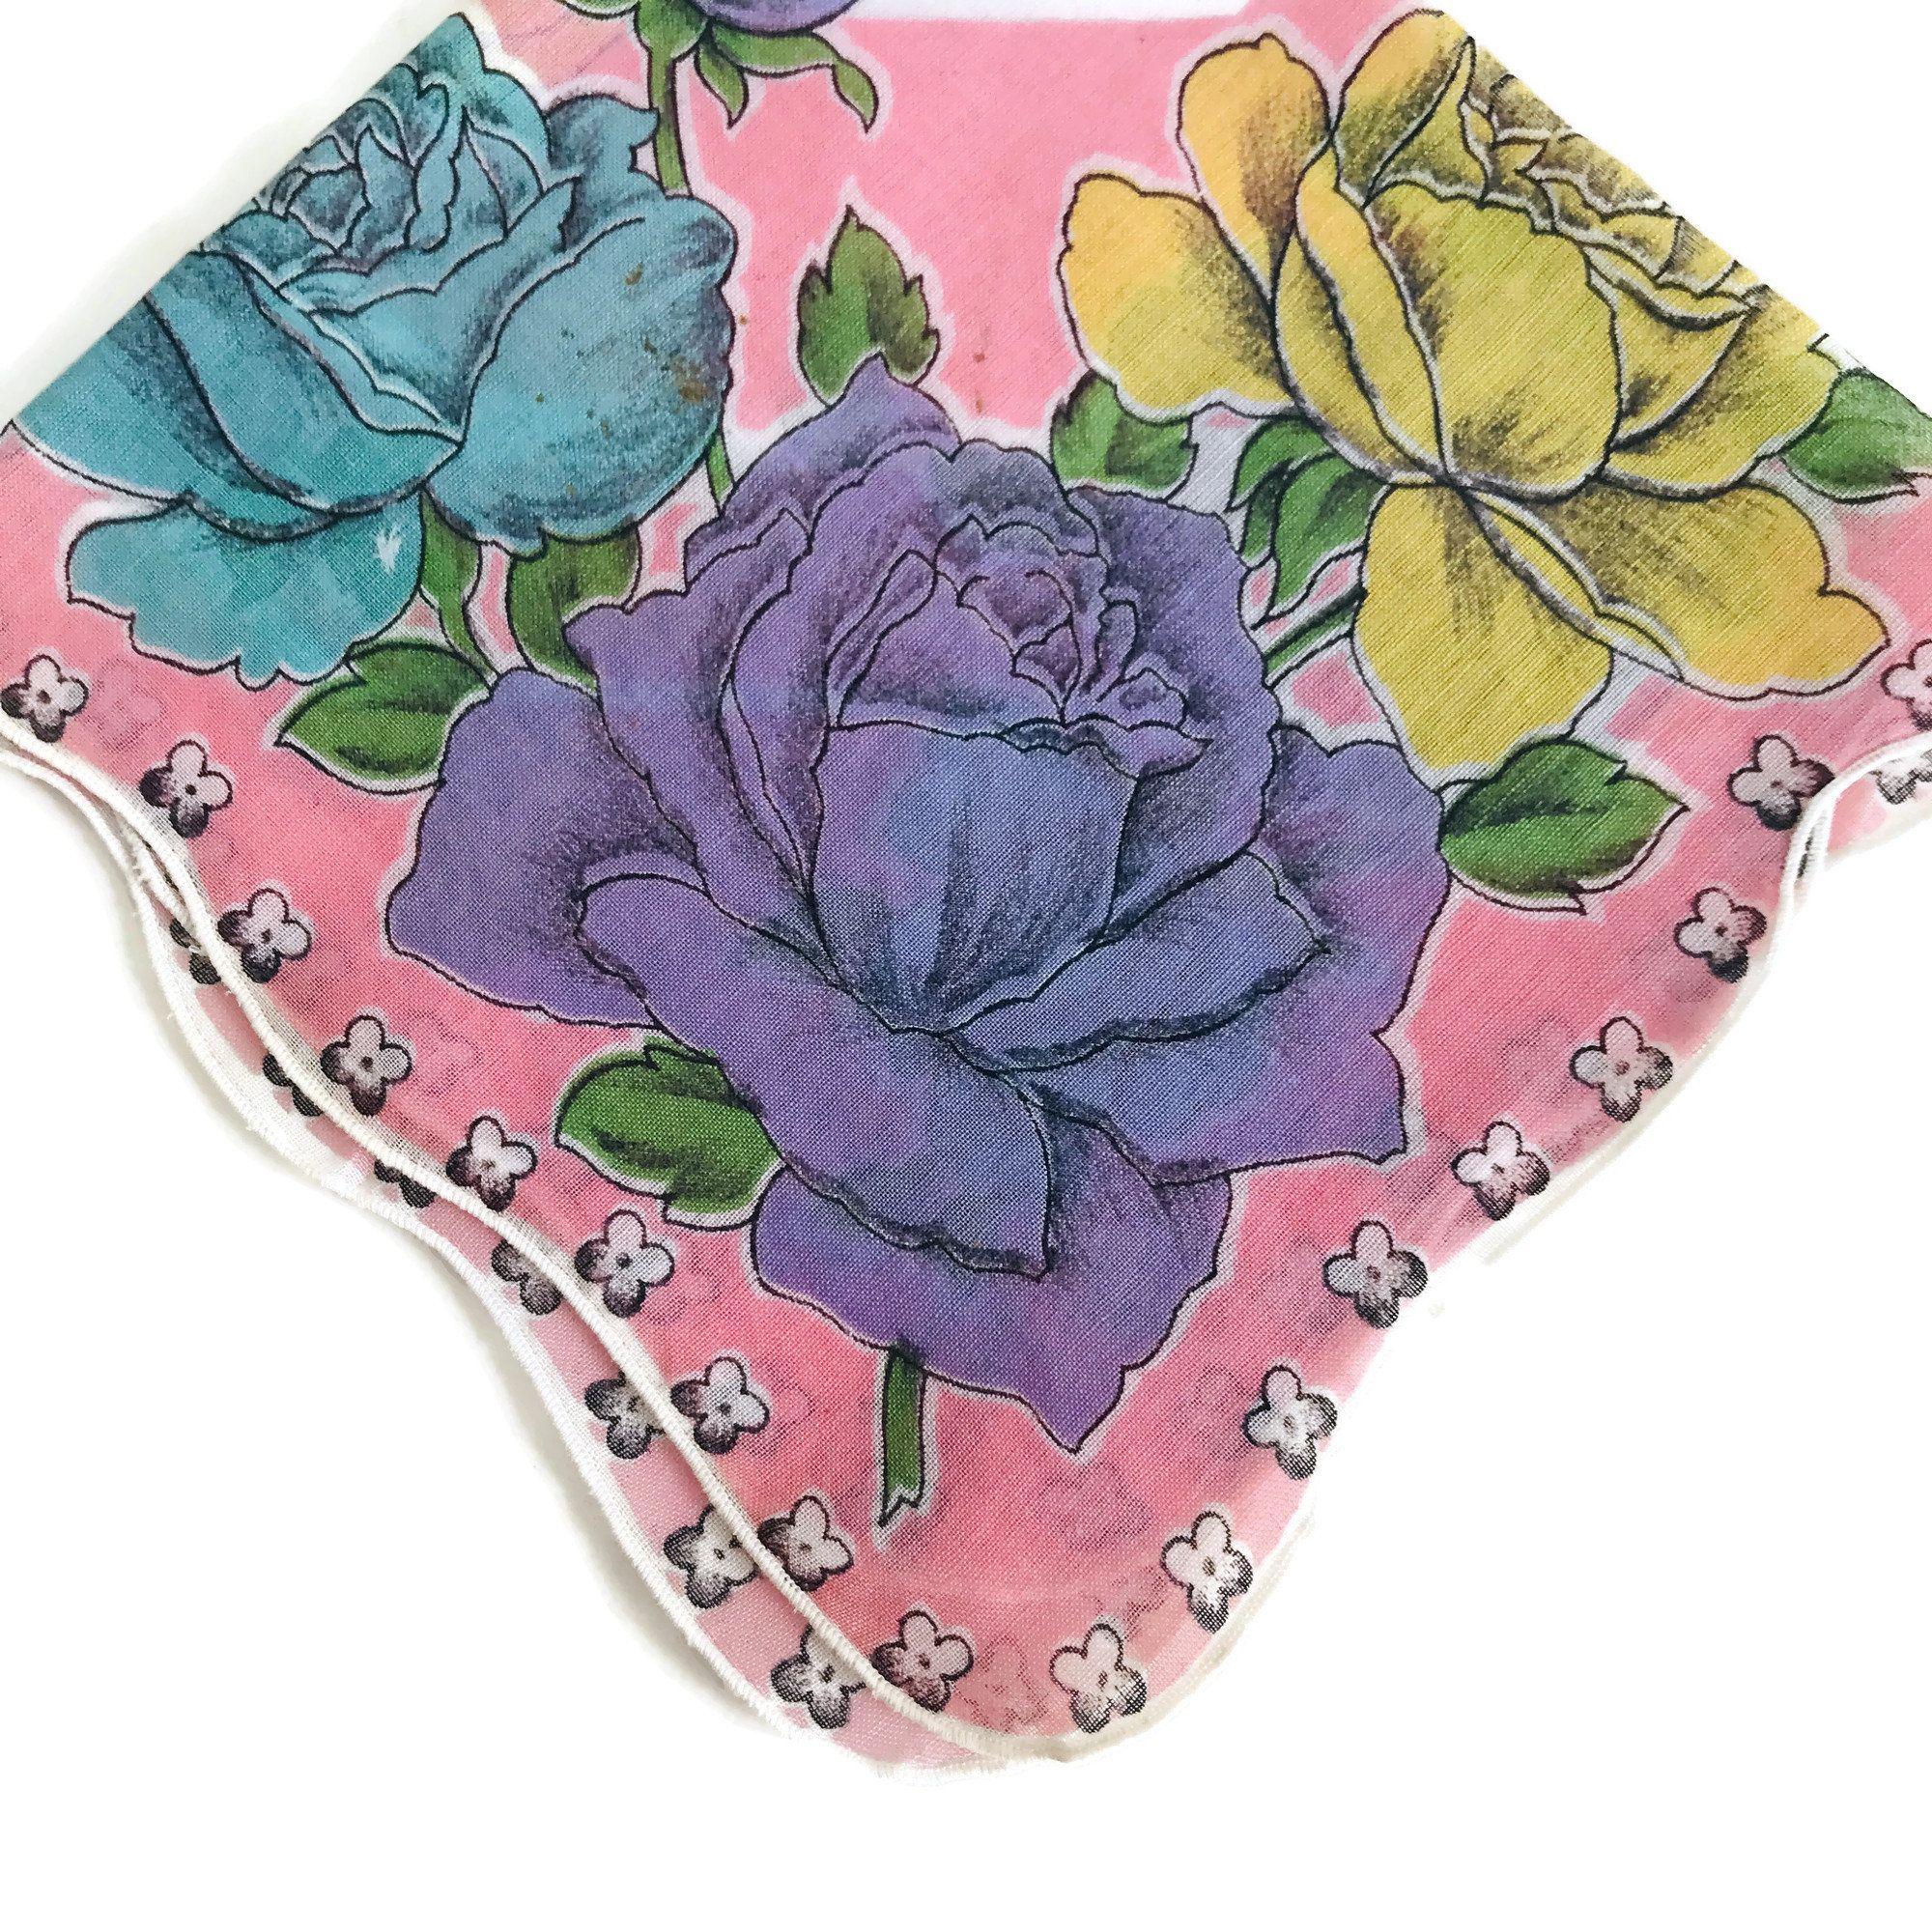 Repurpose Handkerchief Vintage Floral Cotton Hankie Hankie Chic Scalloped Edges Yellow Purple Blue Pink with Big Roses